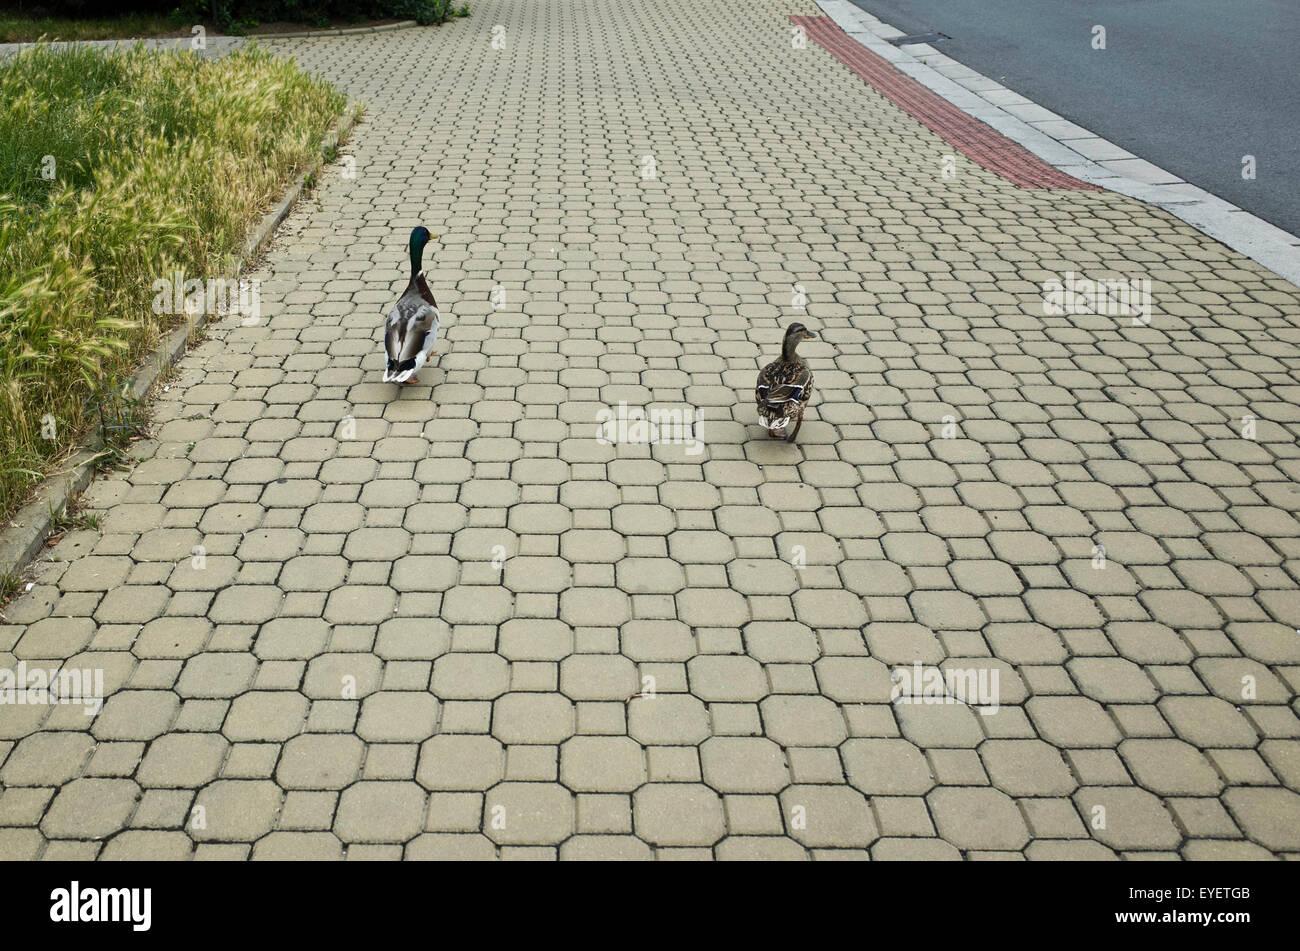 couple of Mallard ducks walking on the sidewalk - Stock Image